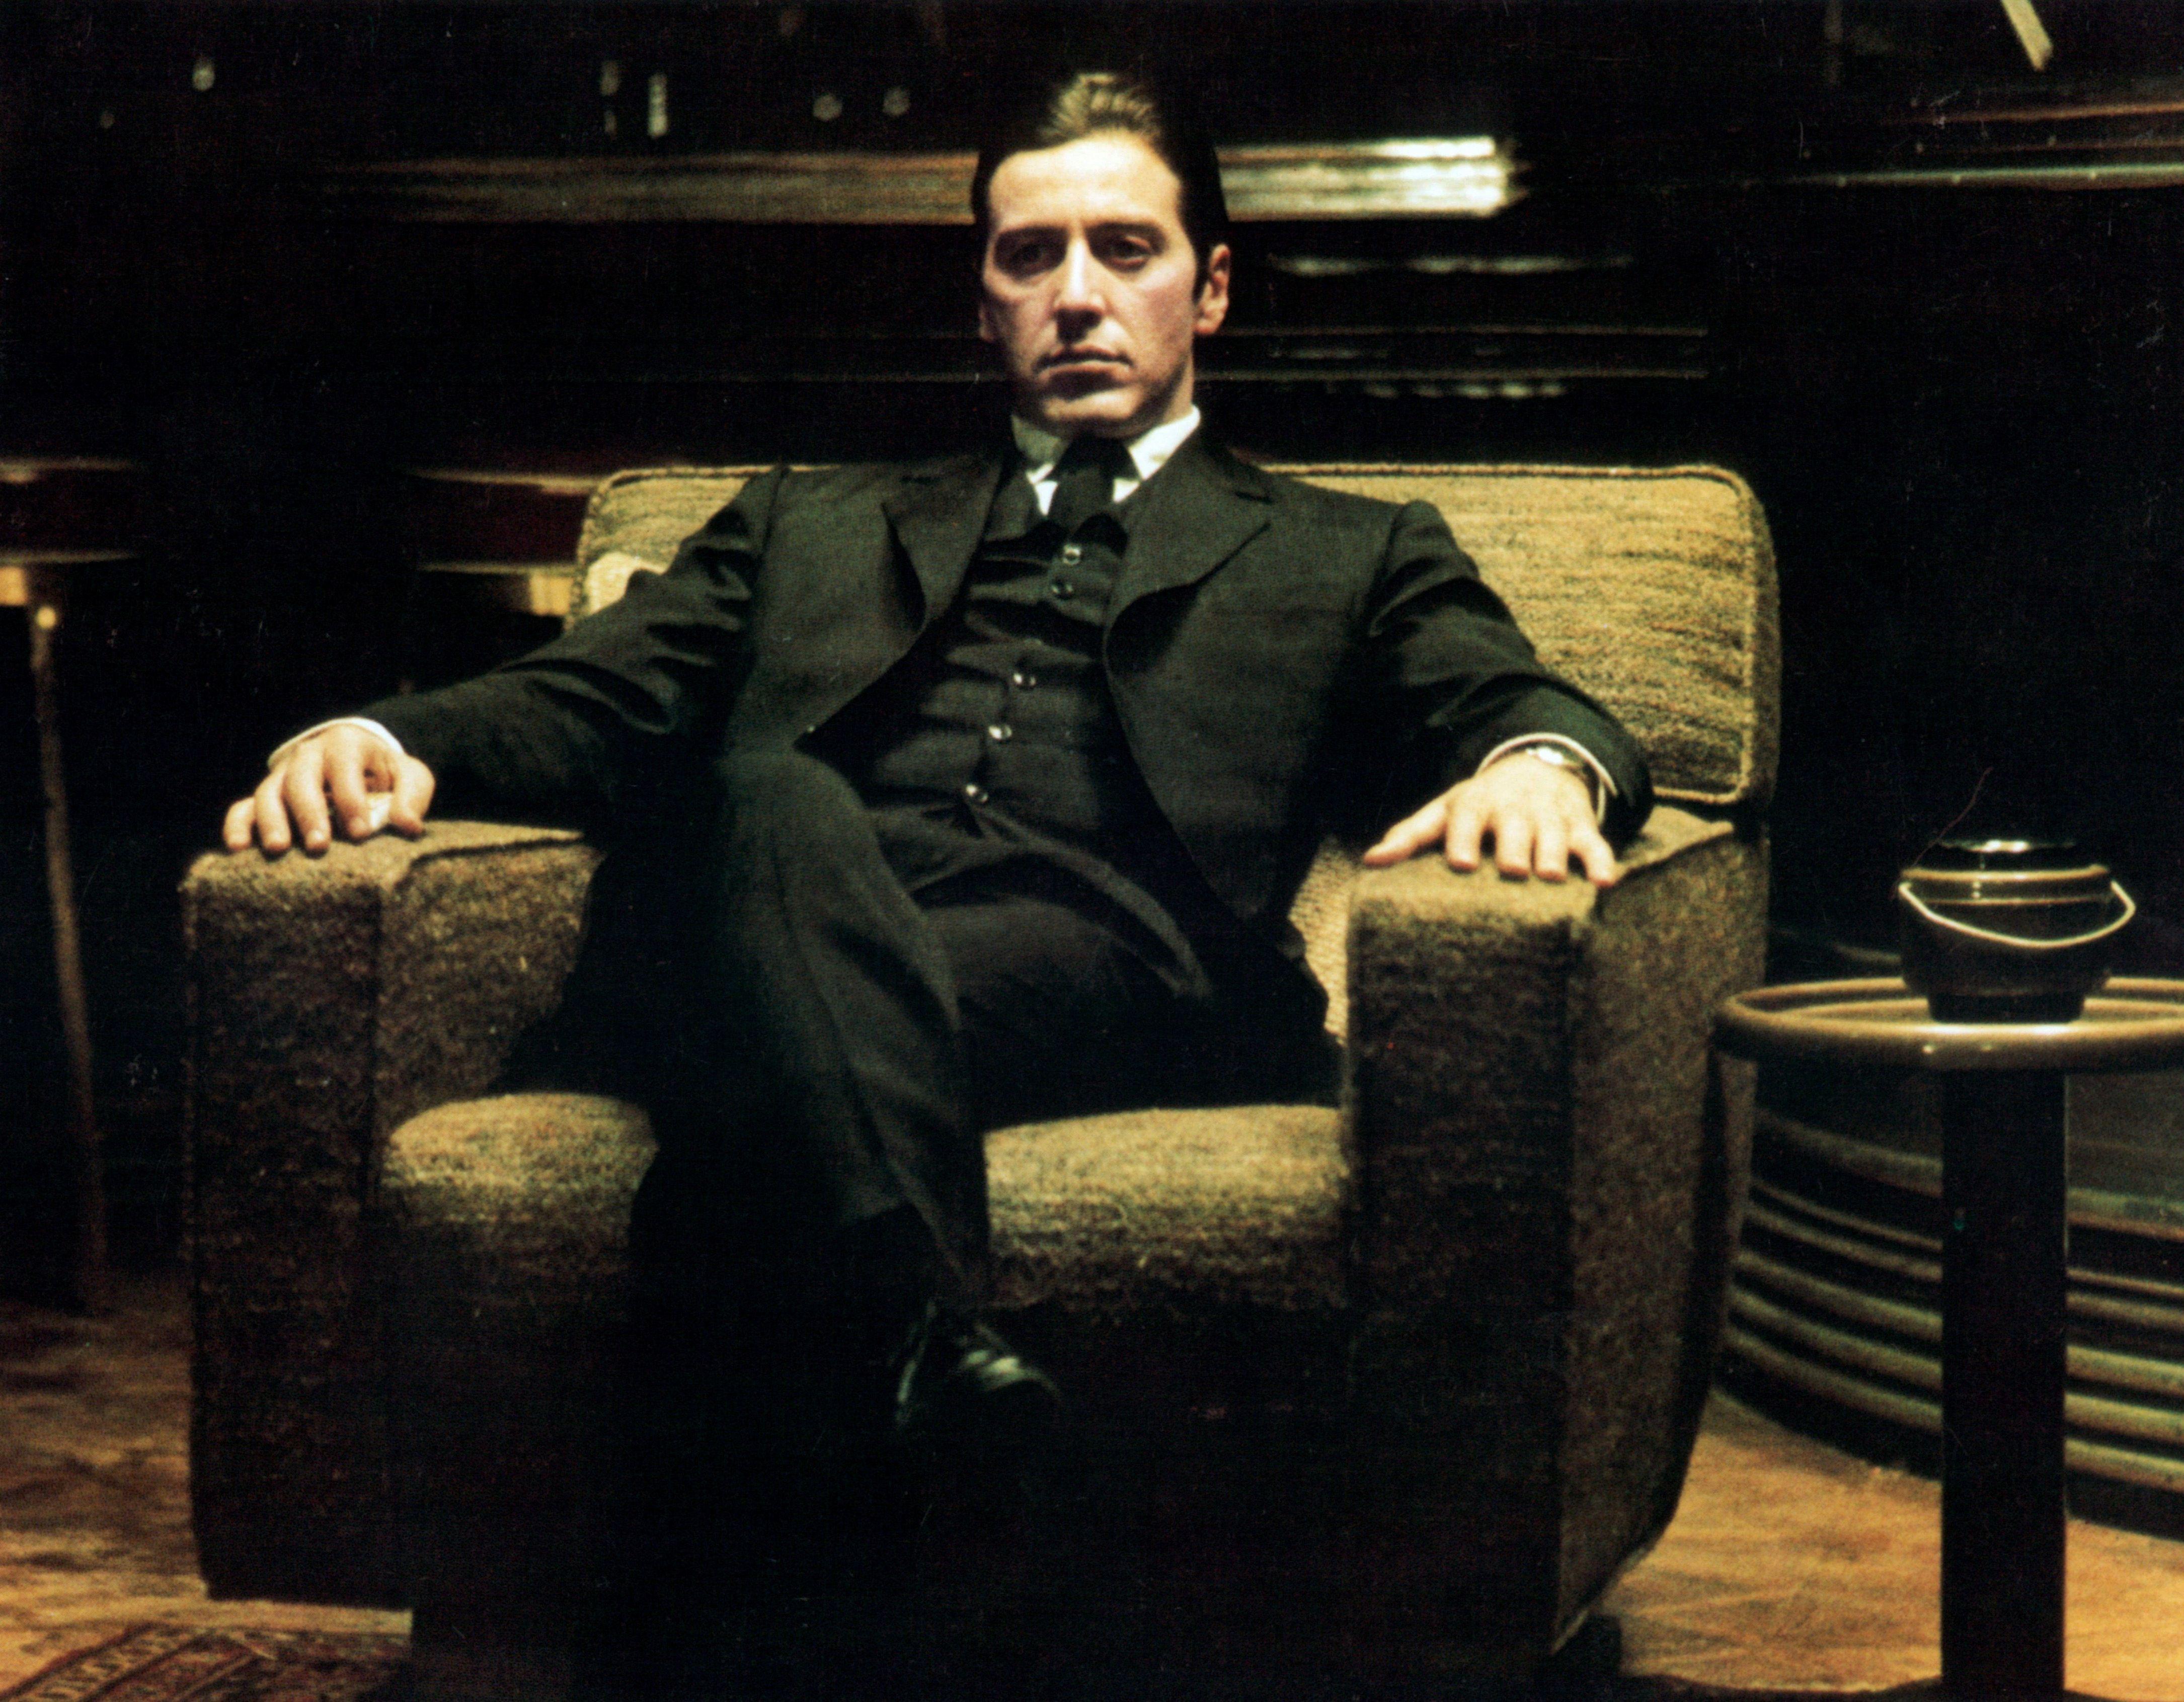 Still Of Al Pacino In Krikstatevis Ii 1974 The Godfather